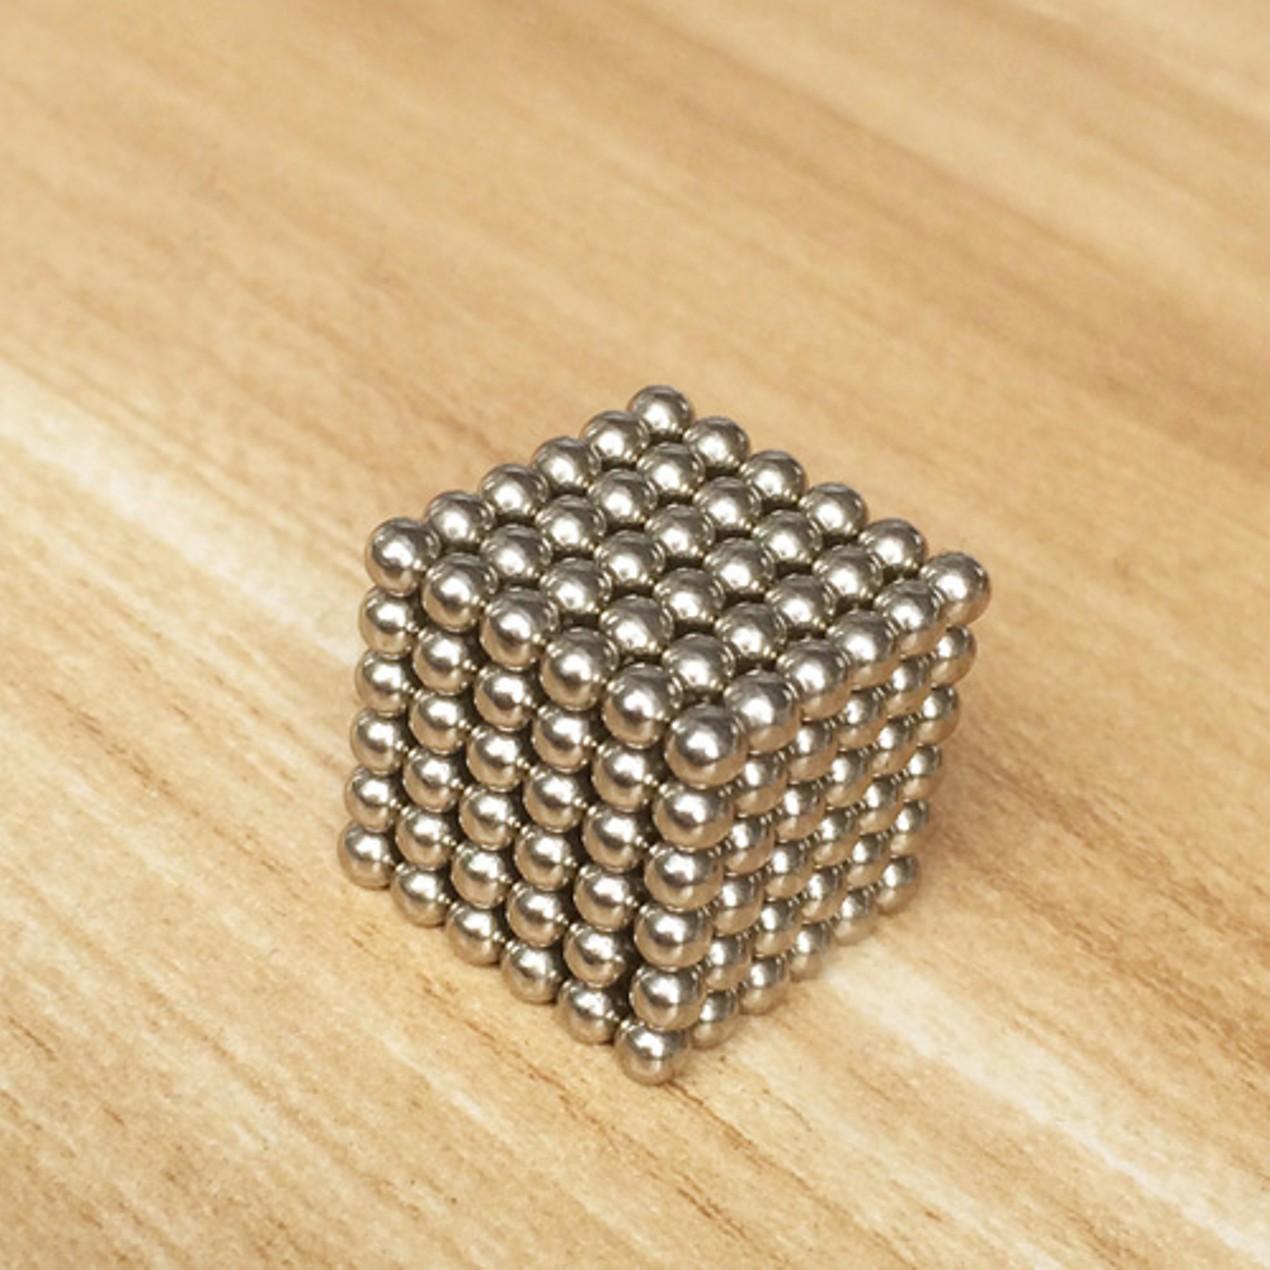 Us Stockenduring Hot 3mm Magic Puzzle Magnetic Ball Tanga Buckyballs Neocube Balls Toys 216pcs Marketplace Deal